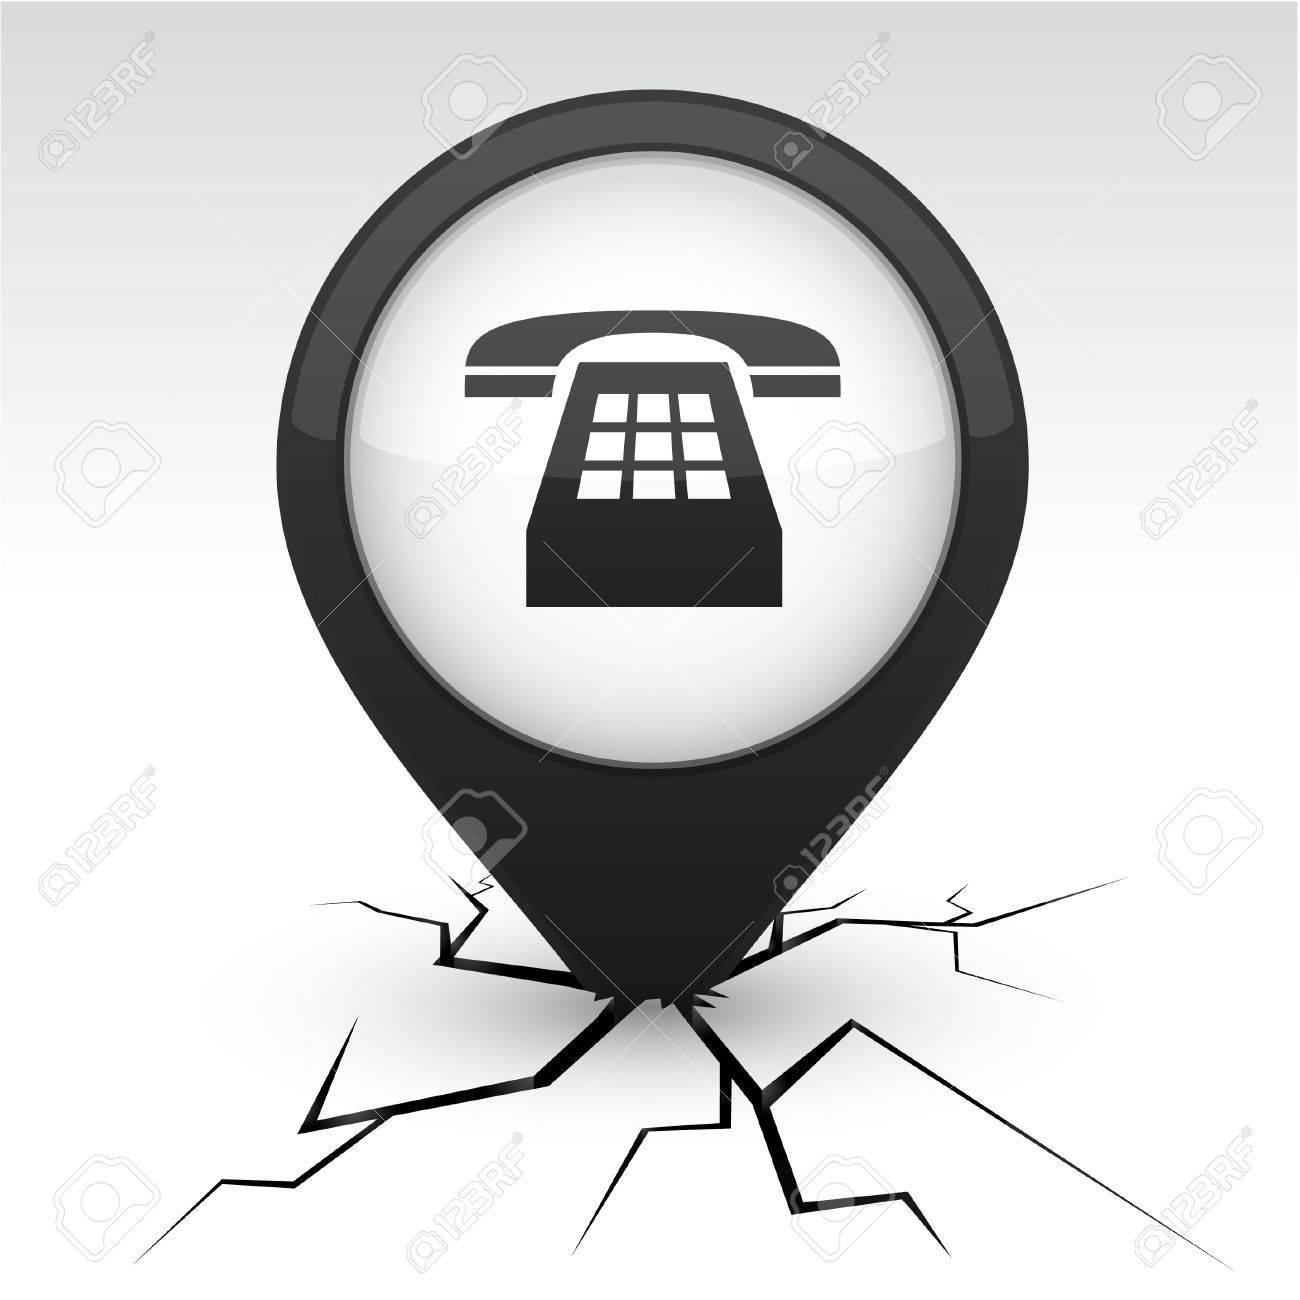 Telephone modern icon. Vector illustration. Stock Vector - 10059215